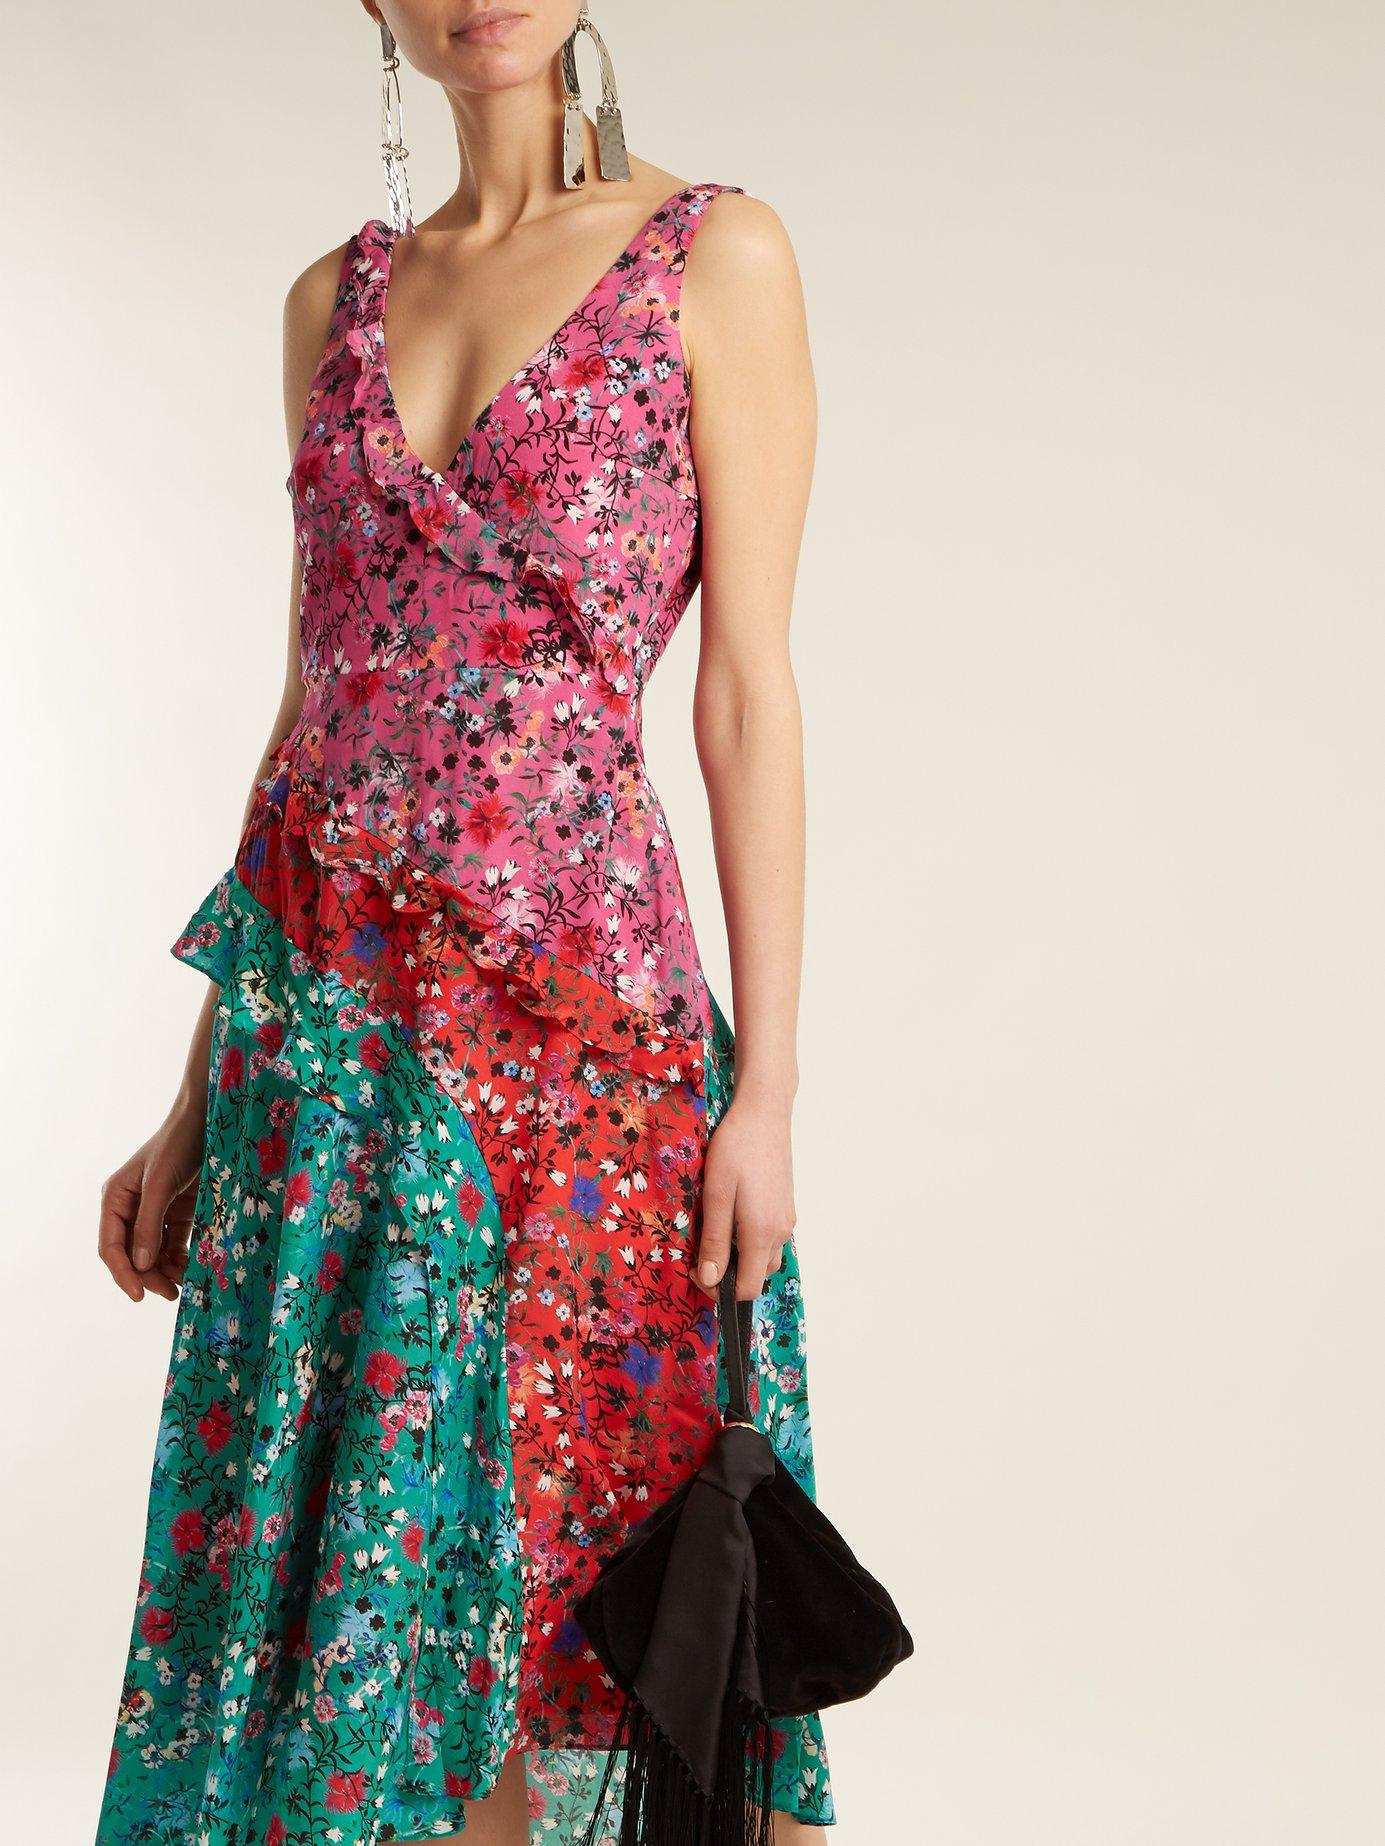 Aggie meadow ruffle dress by Saloni